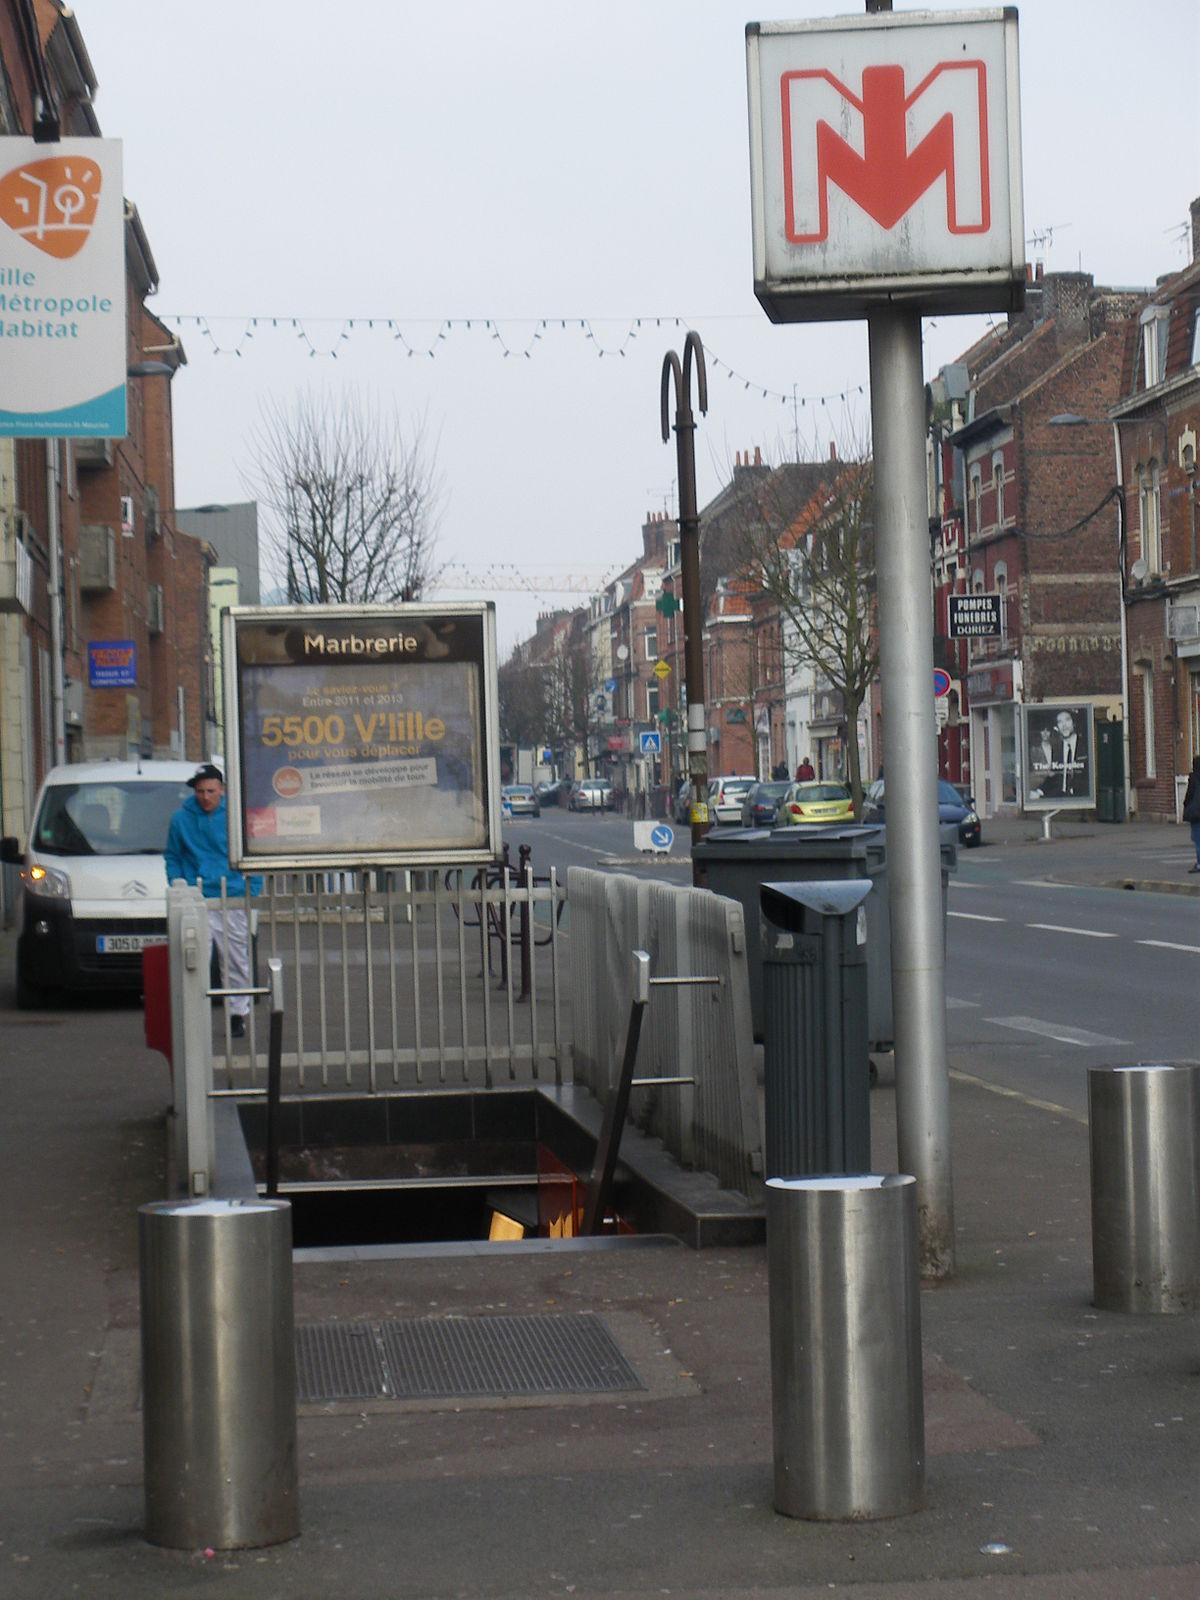 Marbrerie metrostation wikipedia - Station essence porte des postes lille ...